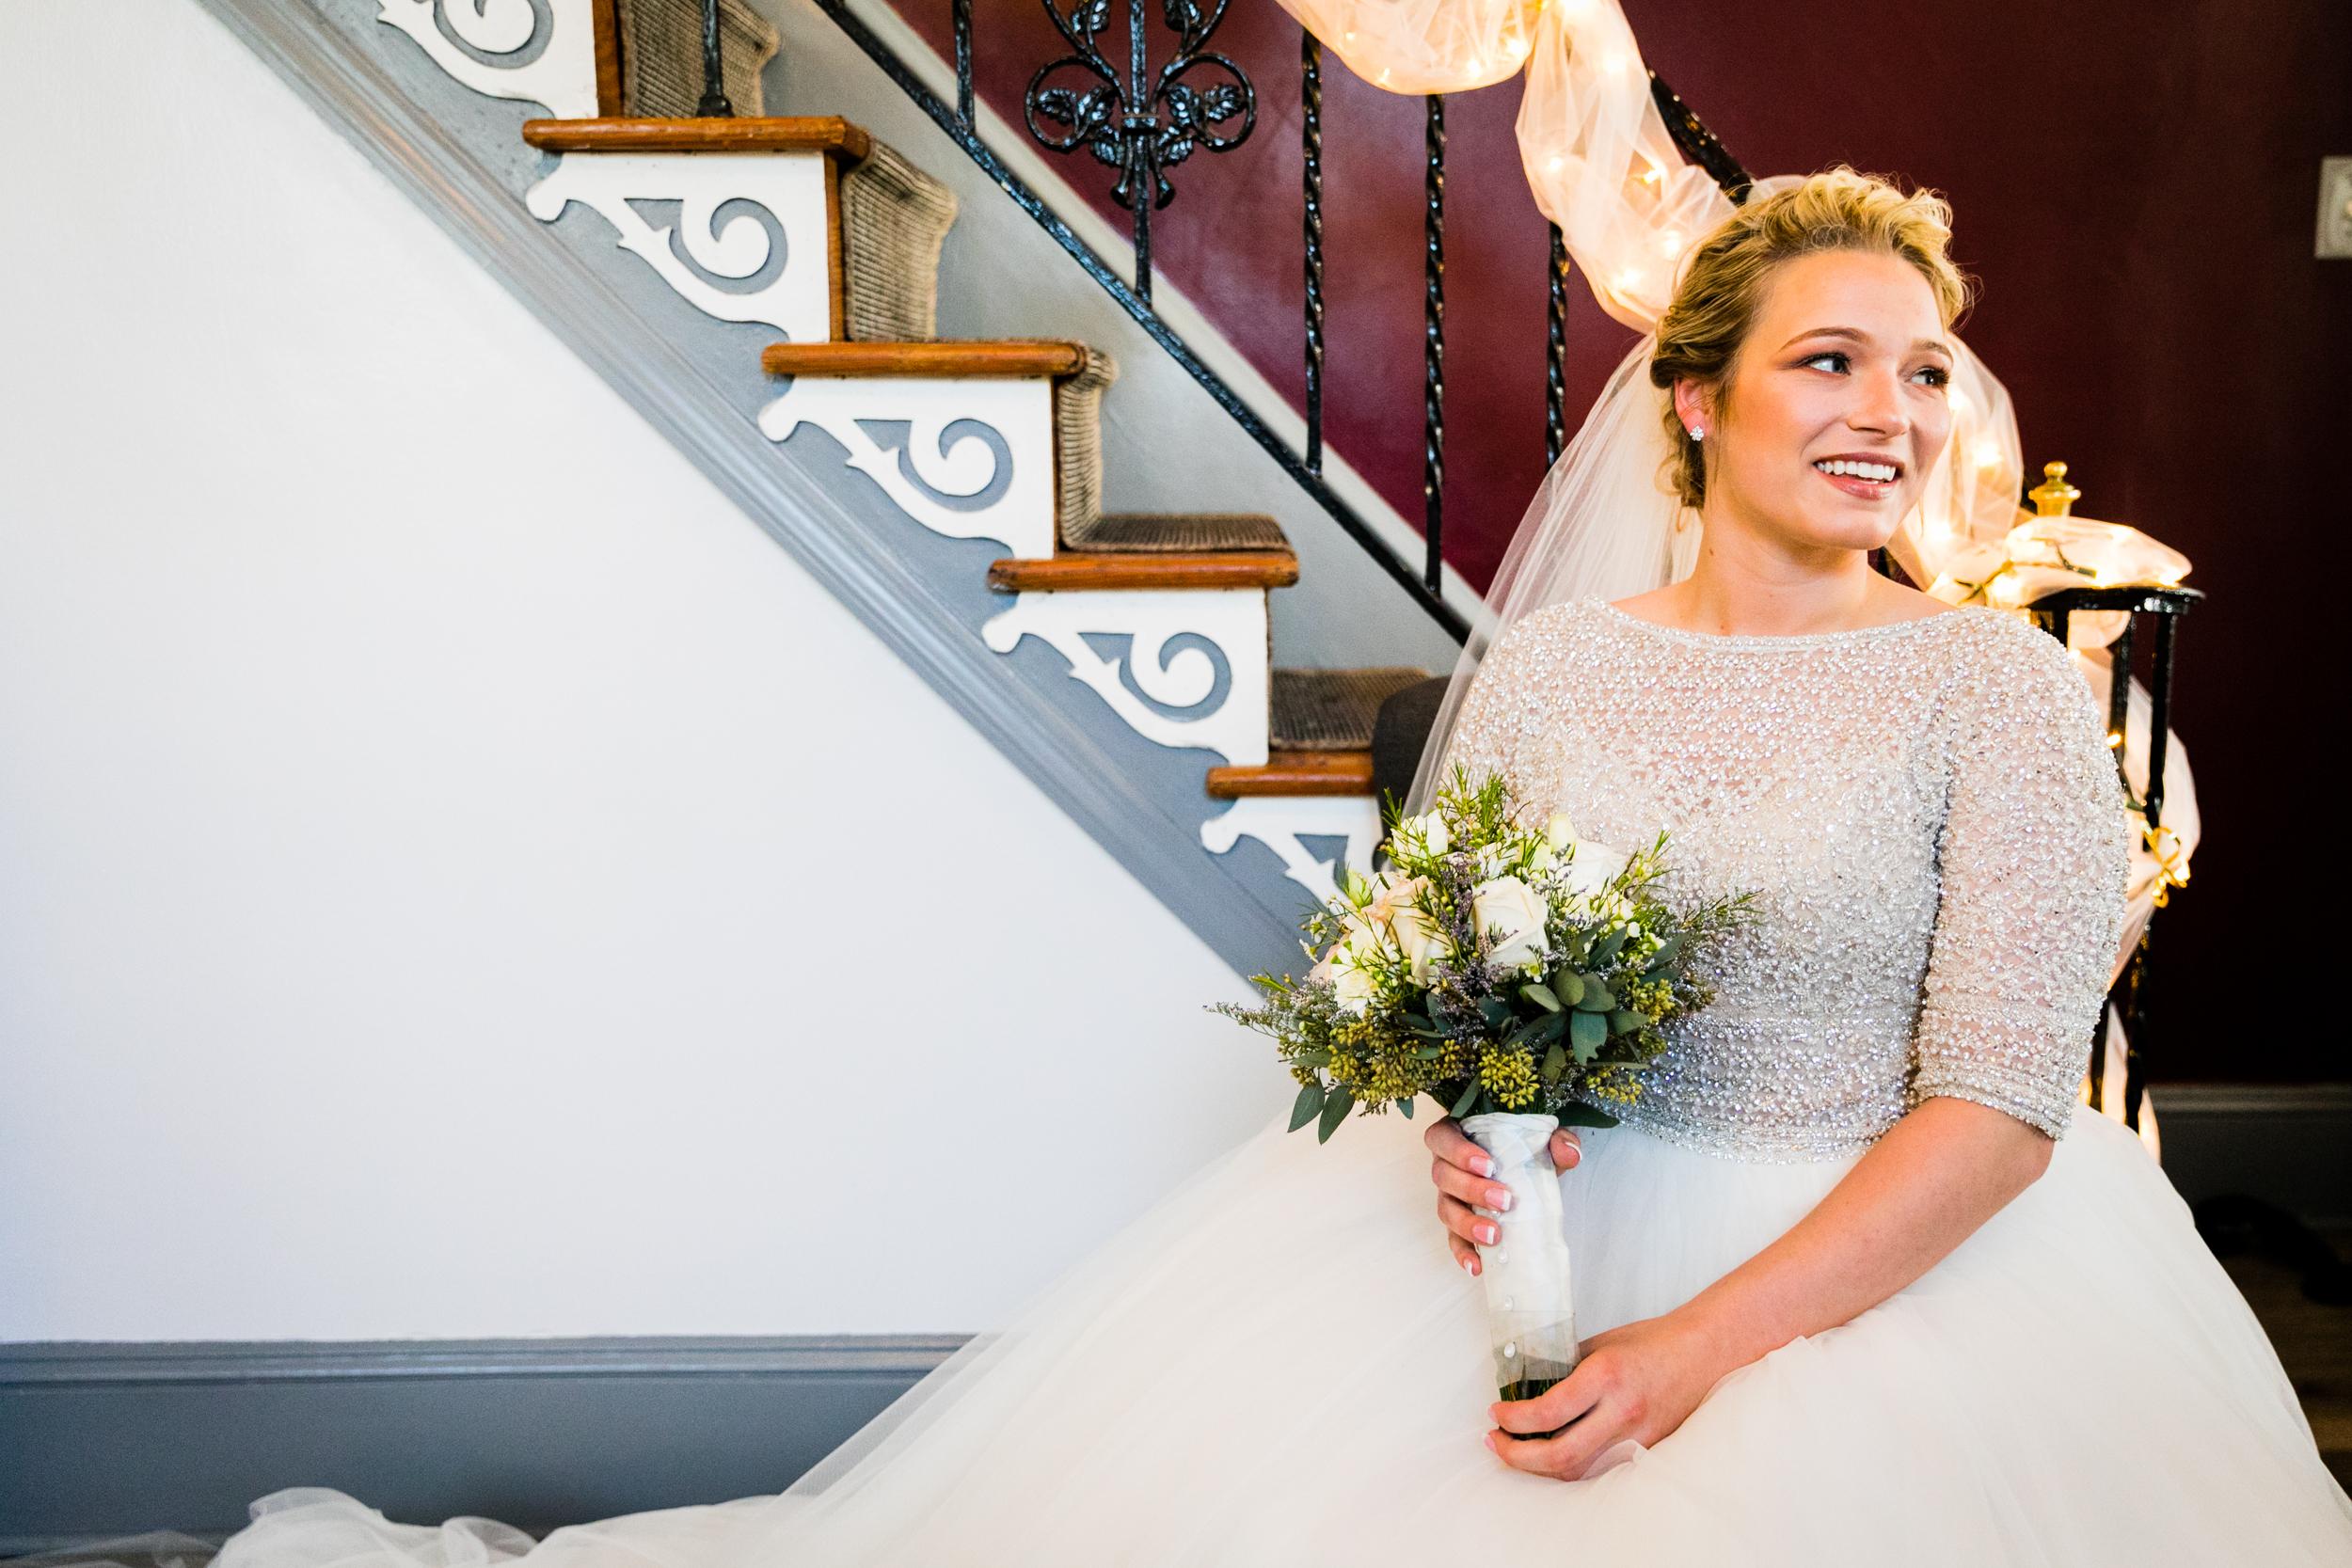 CELEBRATIONS BENSALEM WEDDING PHOTOGRAPHY-34.jpg